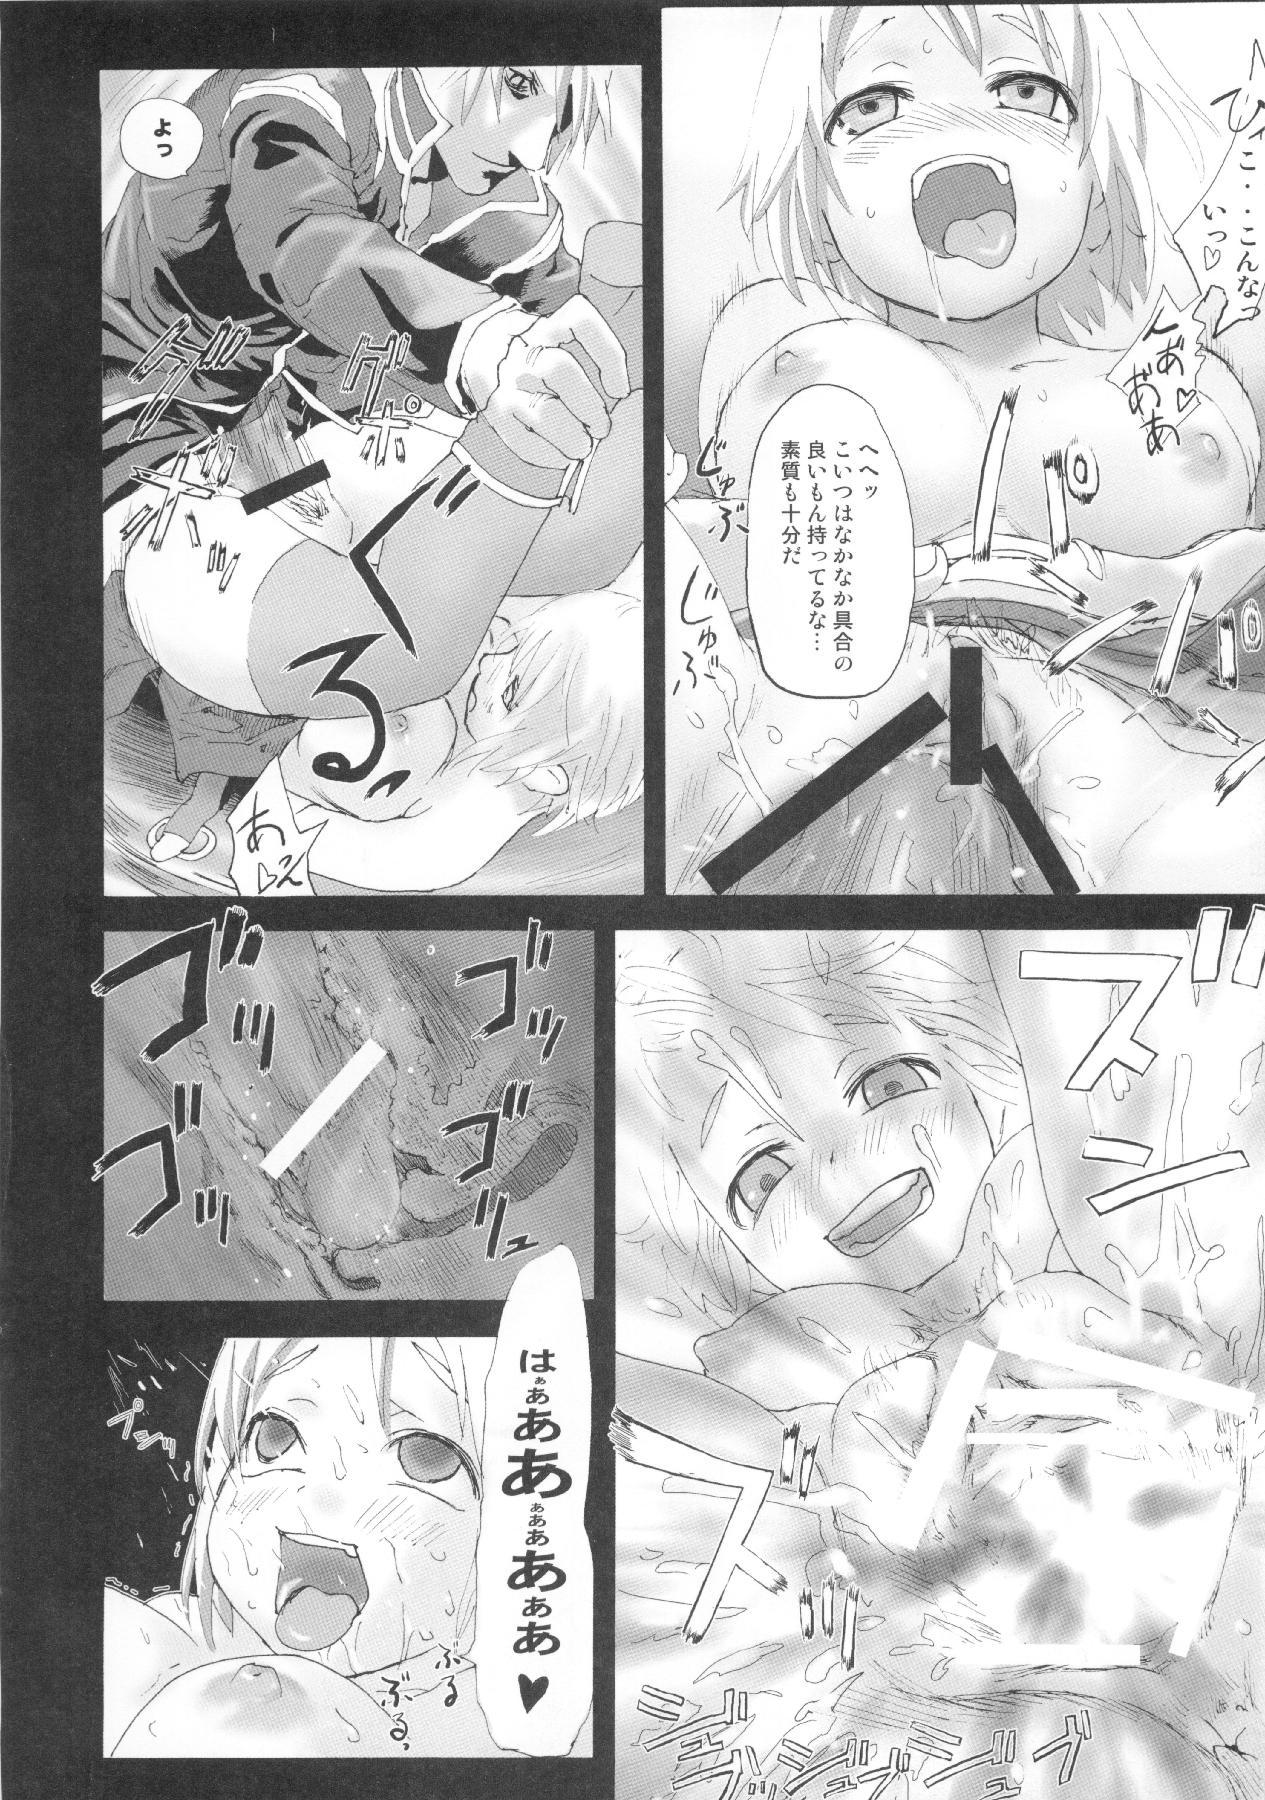 (C83) [Fatalpulse (Asanagi)] VictimGirls Compiled Vol.1 -Victimgirls Soushuuhen 1- MMO Game Selection (Various) 62